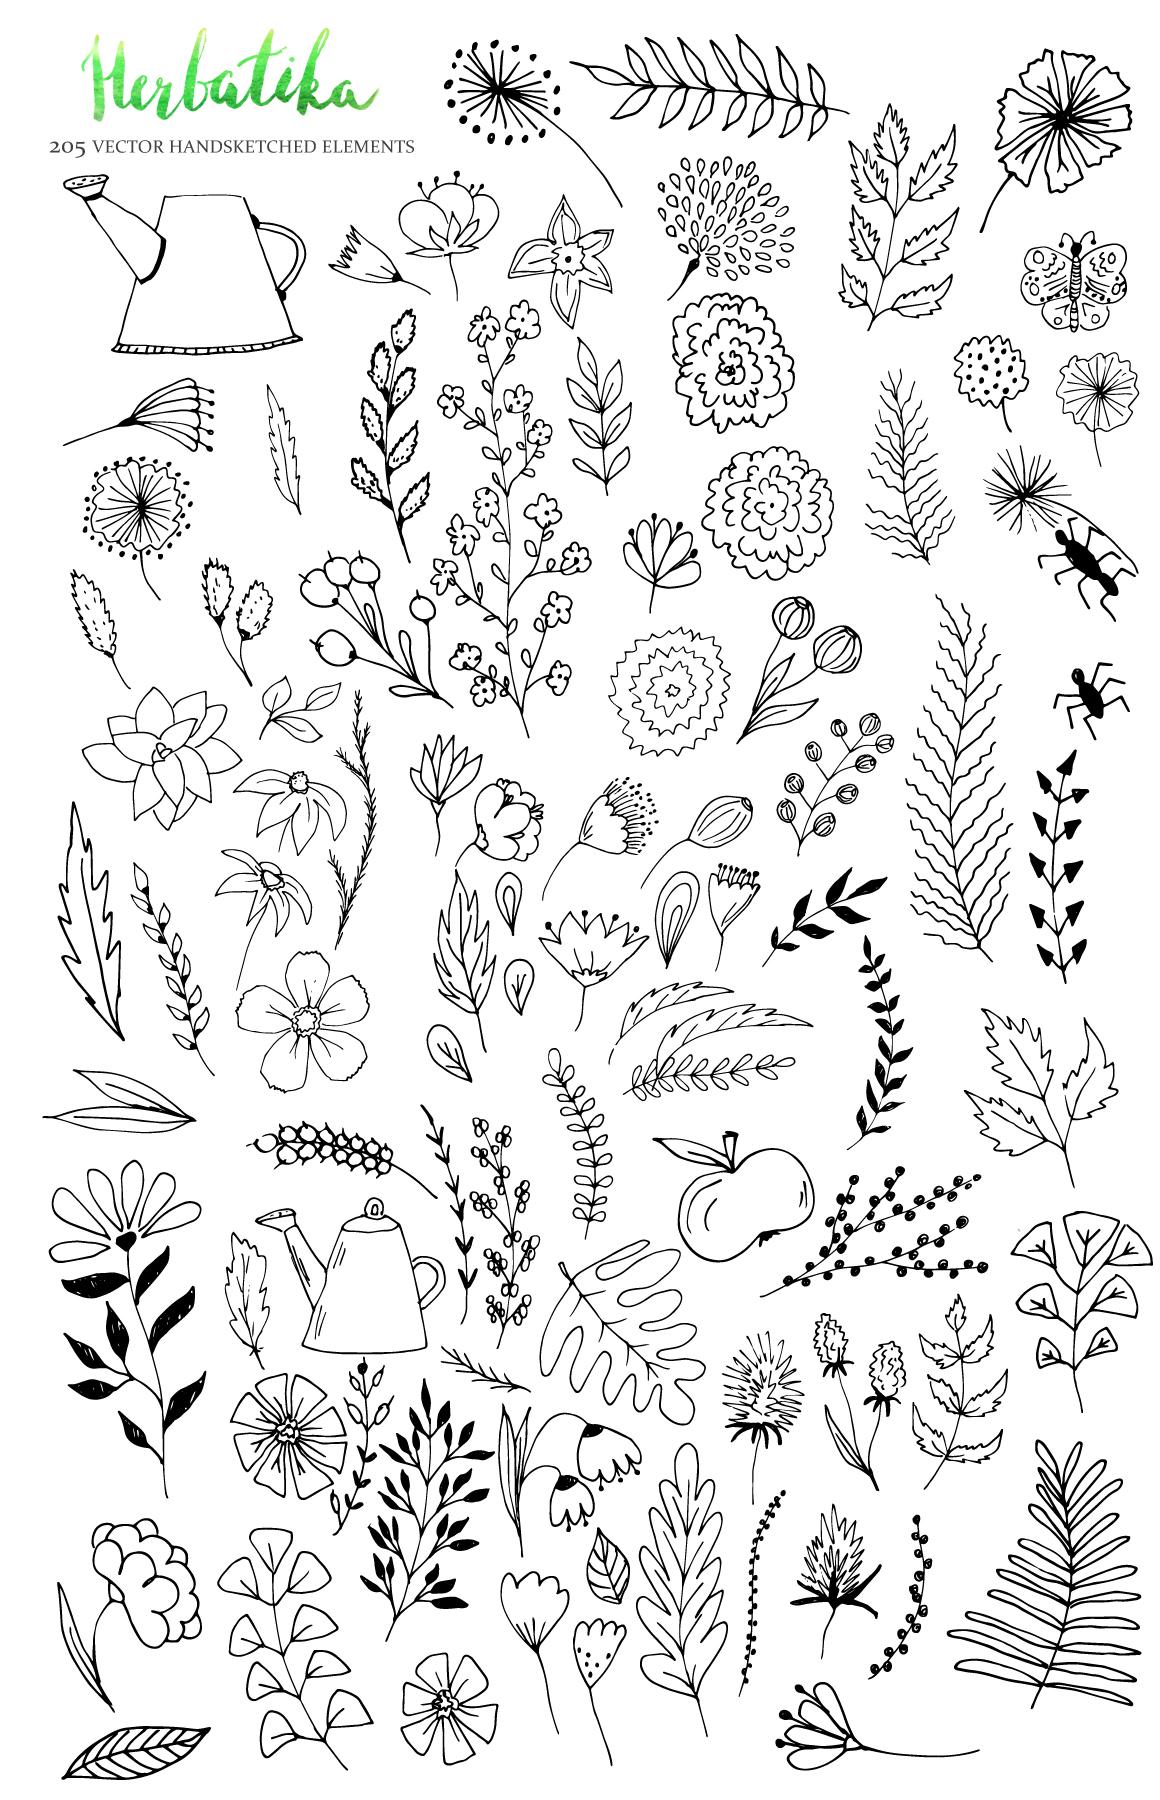 Herbatika Vector Sketched Set example image 3